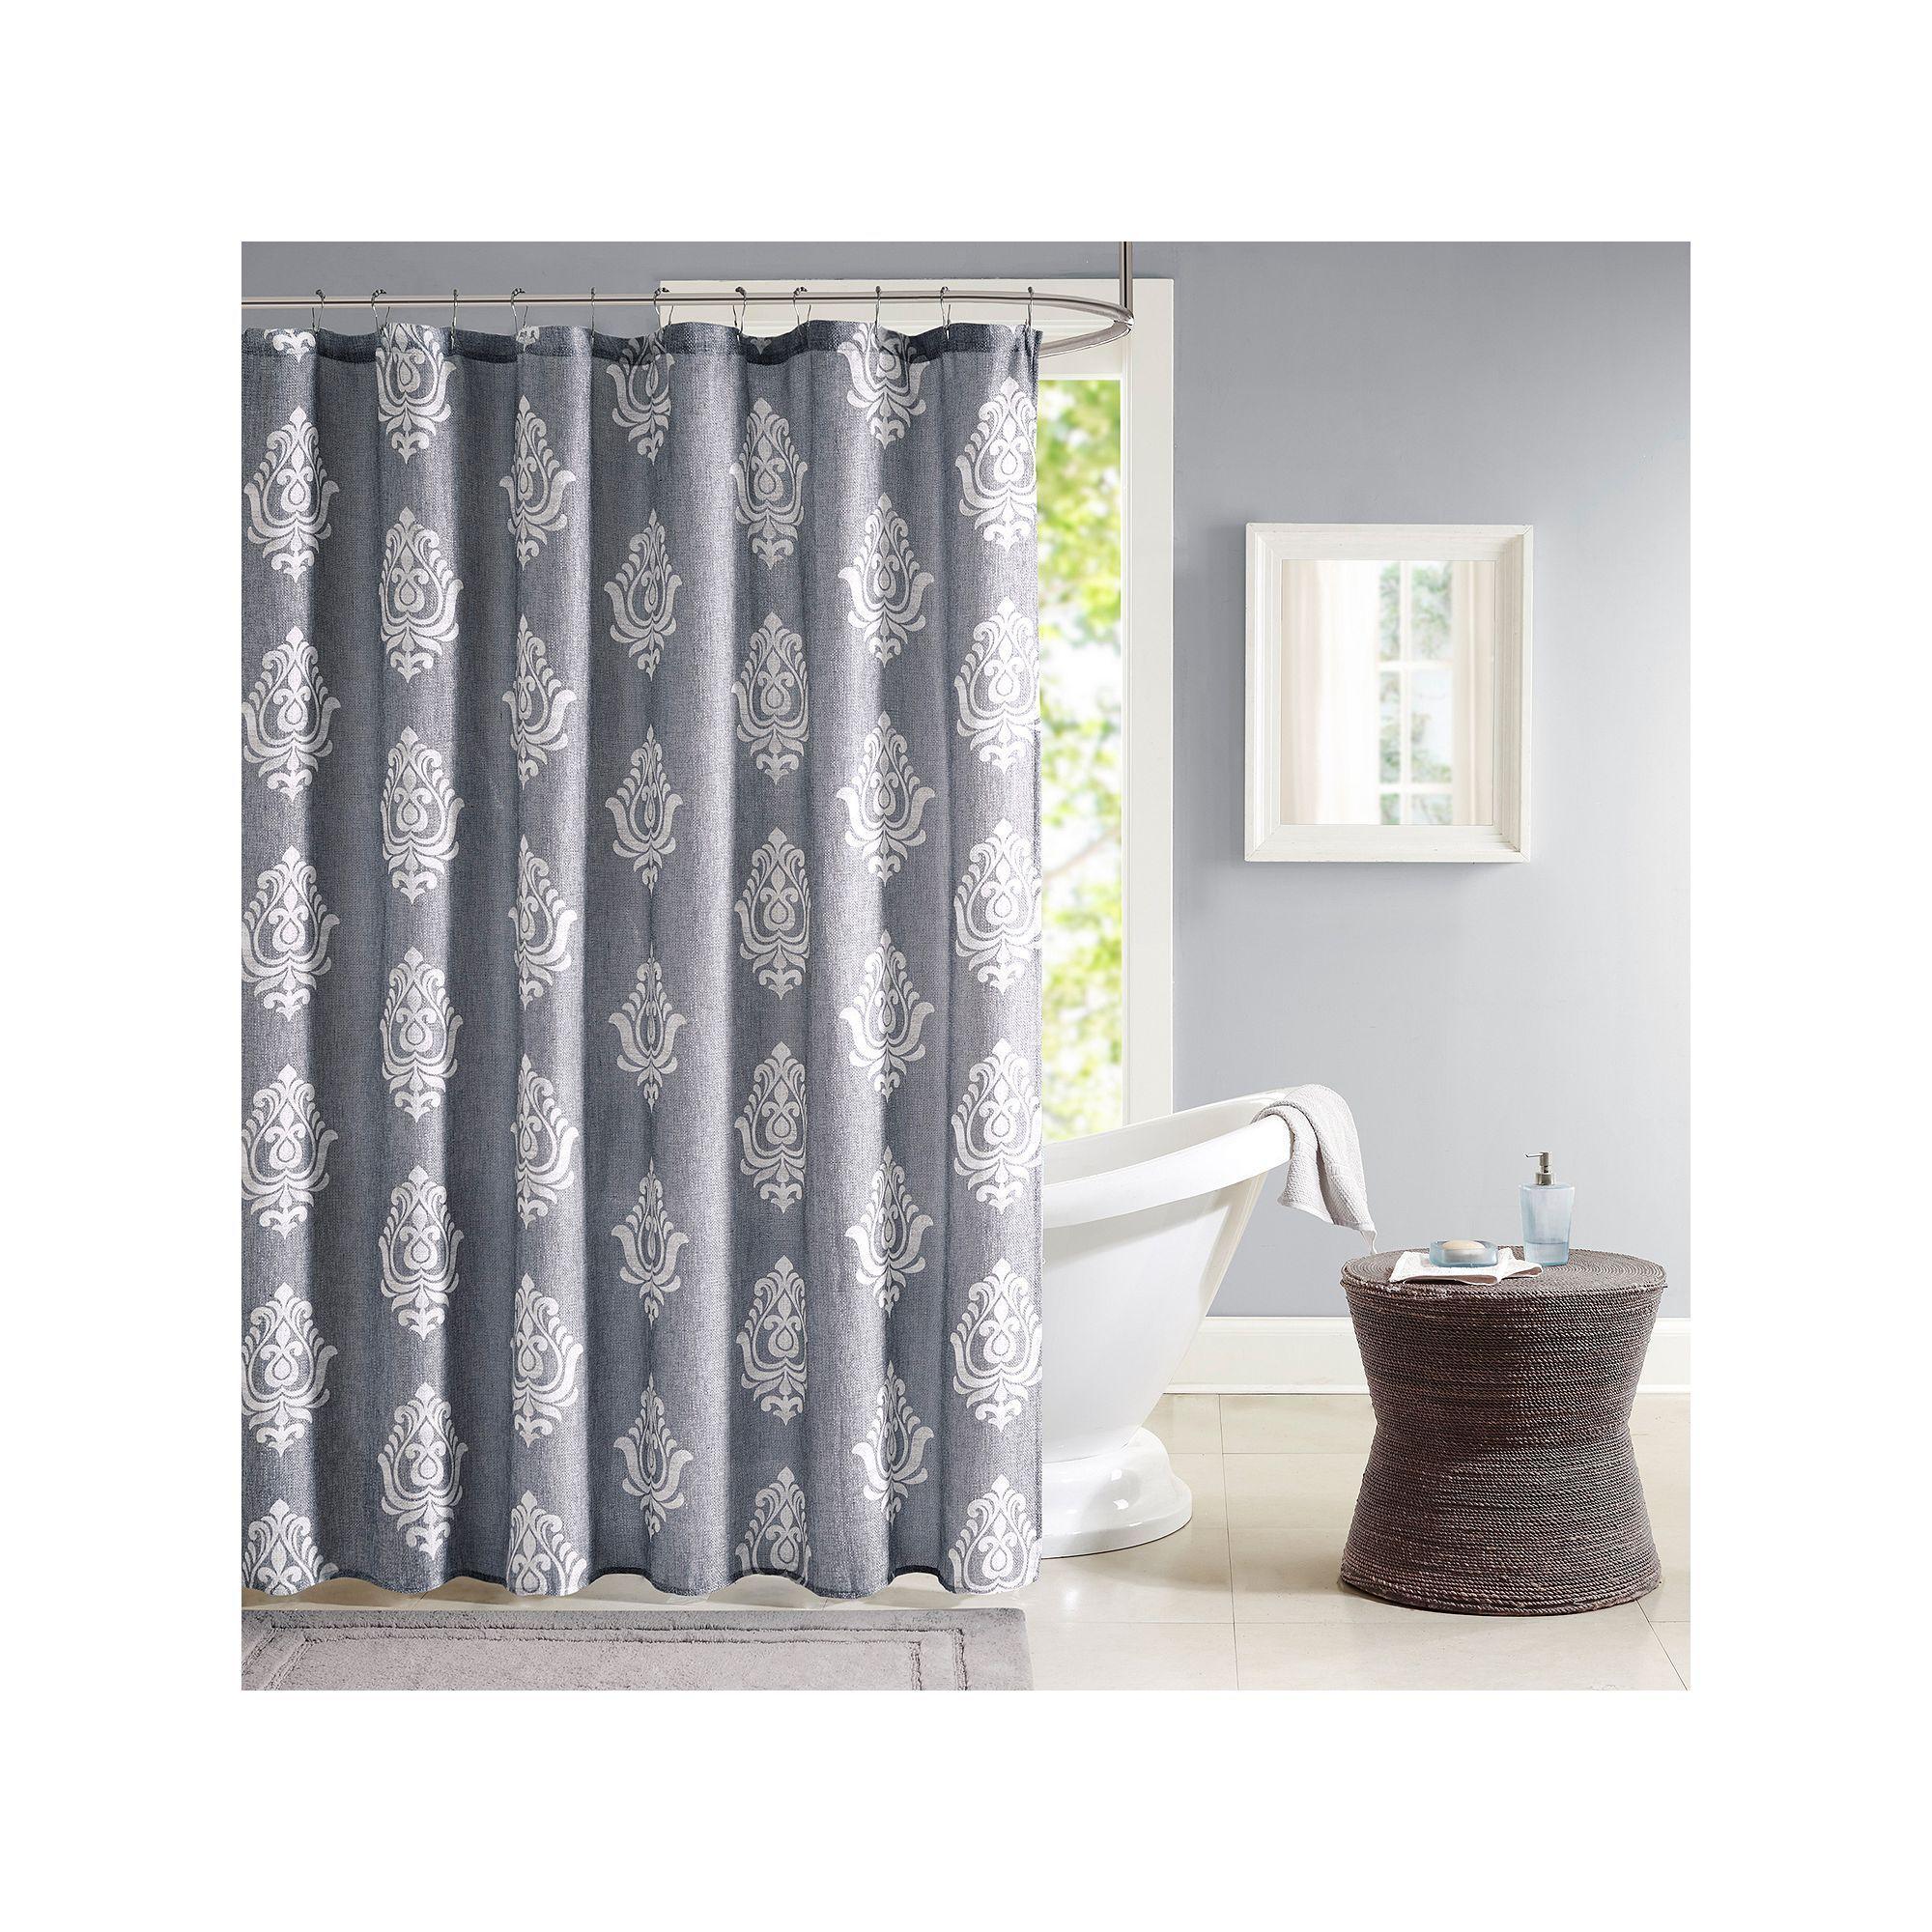 Madison park kensington texture print shower curtain grey products